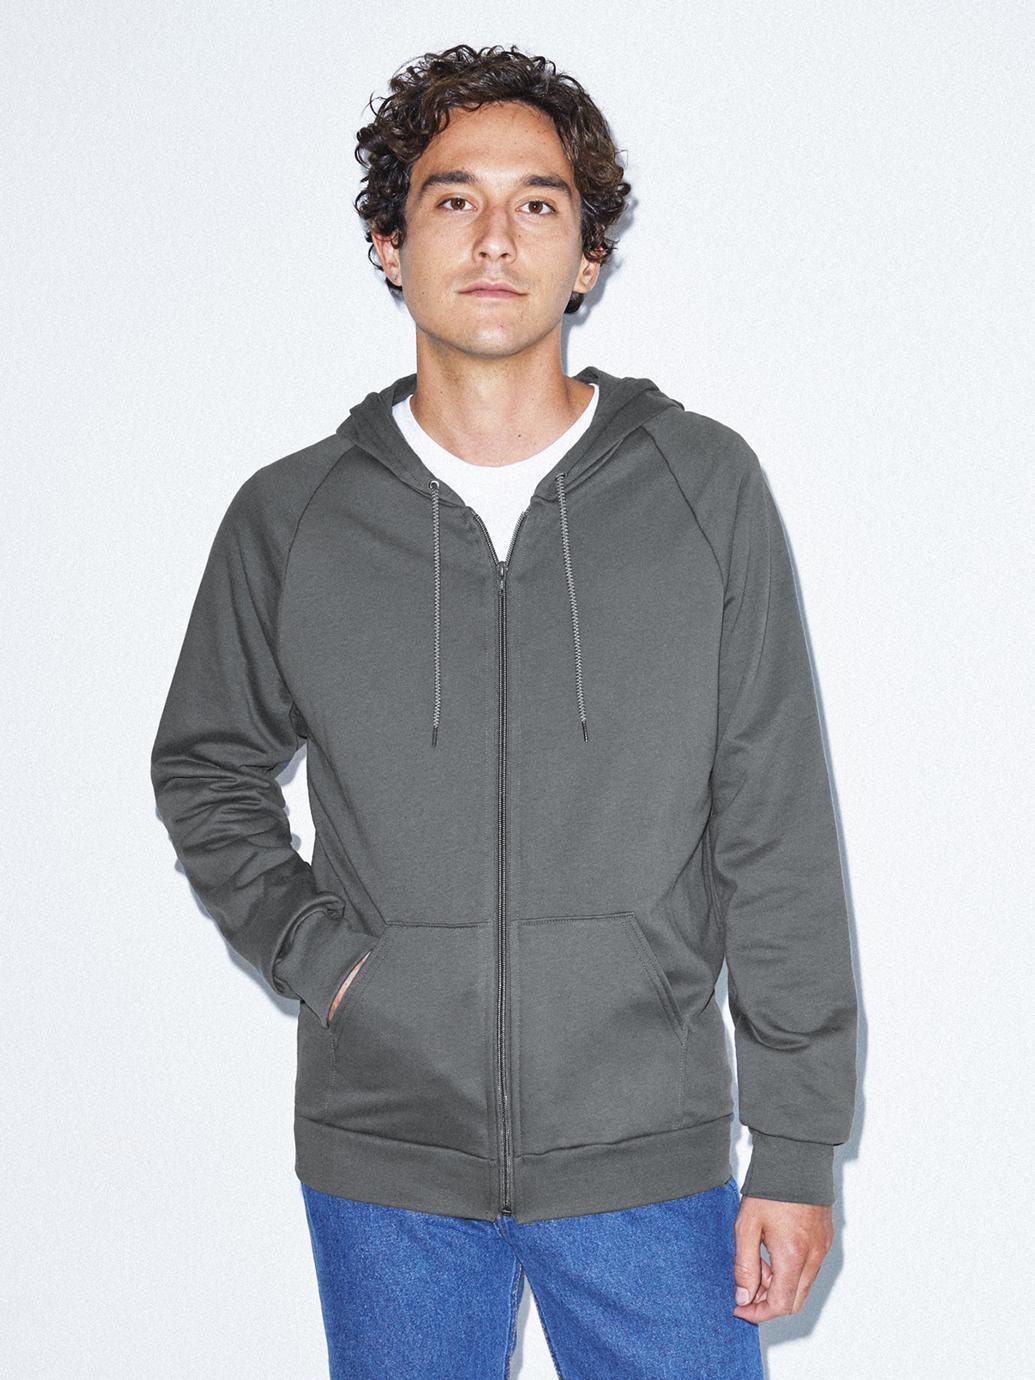 American Apparel 50% Off Sale: California Fleece Zip Hoodie